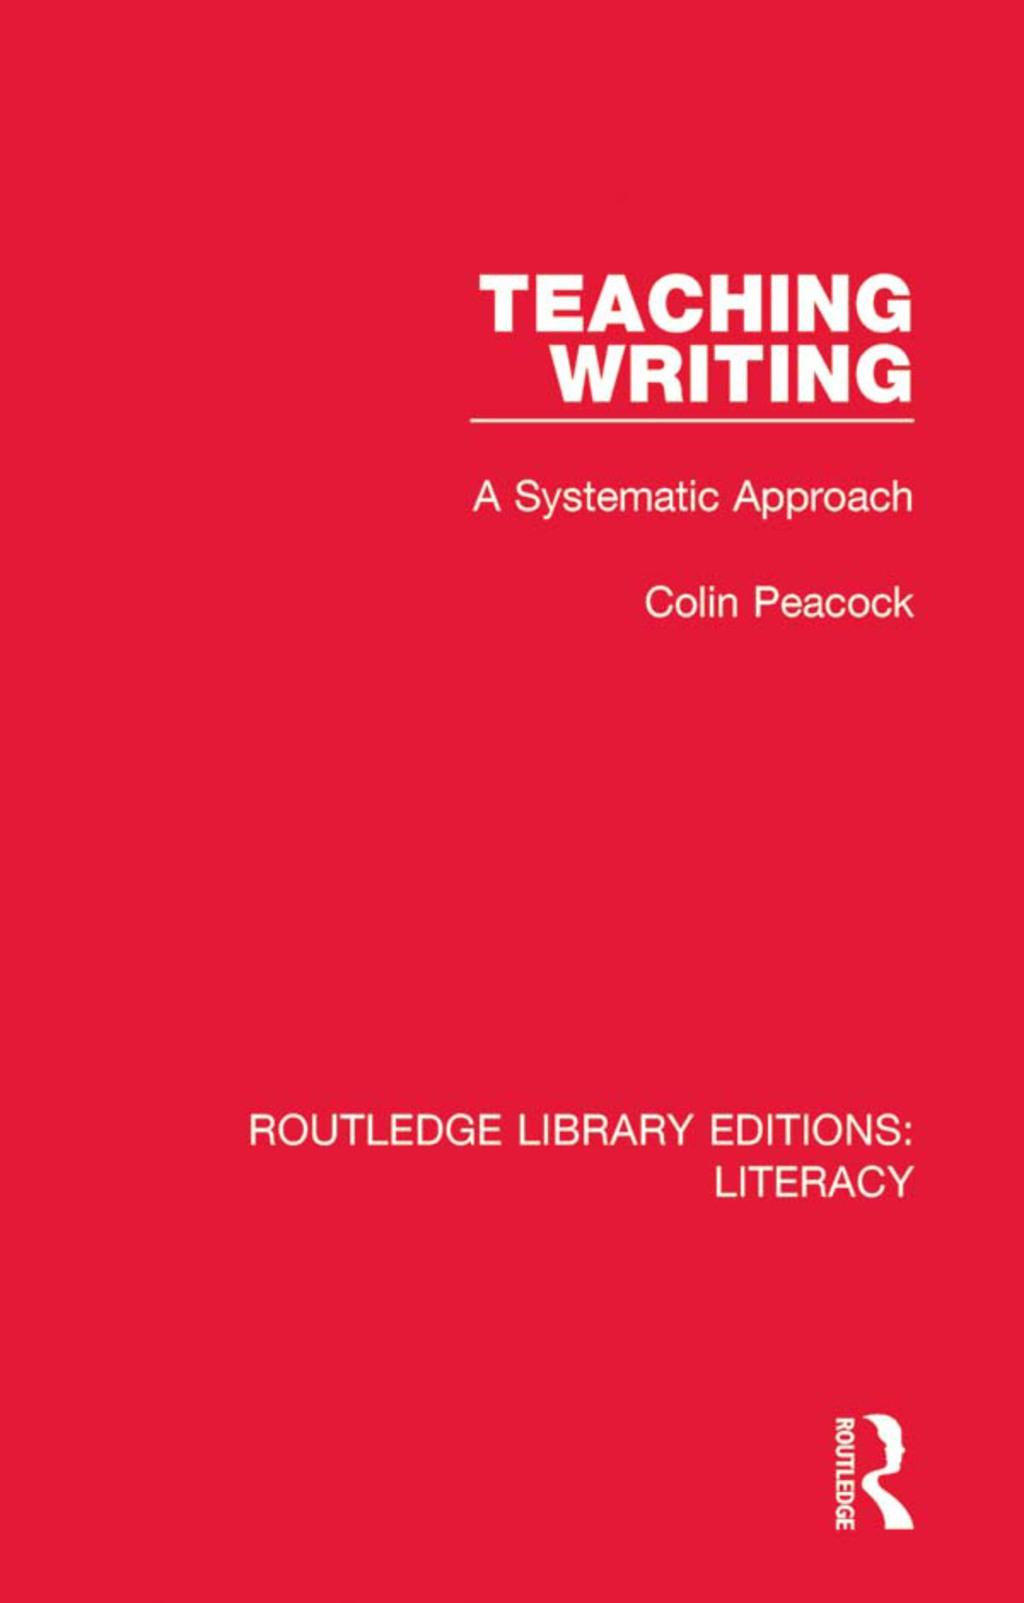 Teaching Writing (eBook Rental)